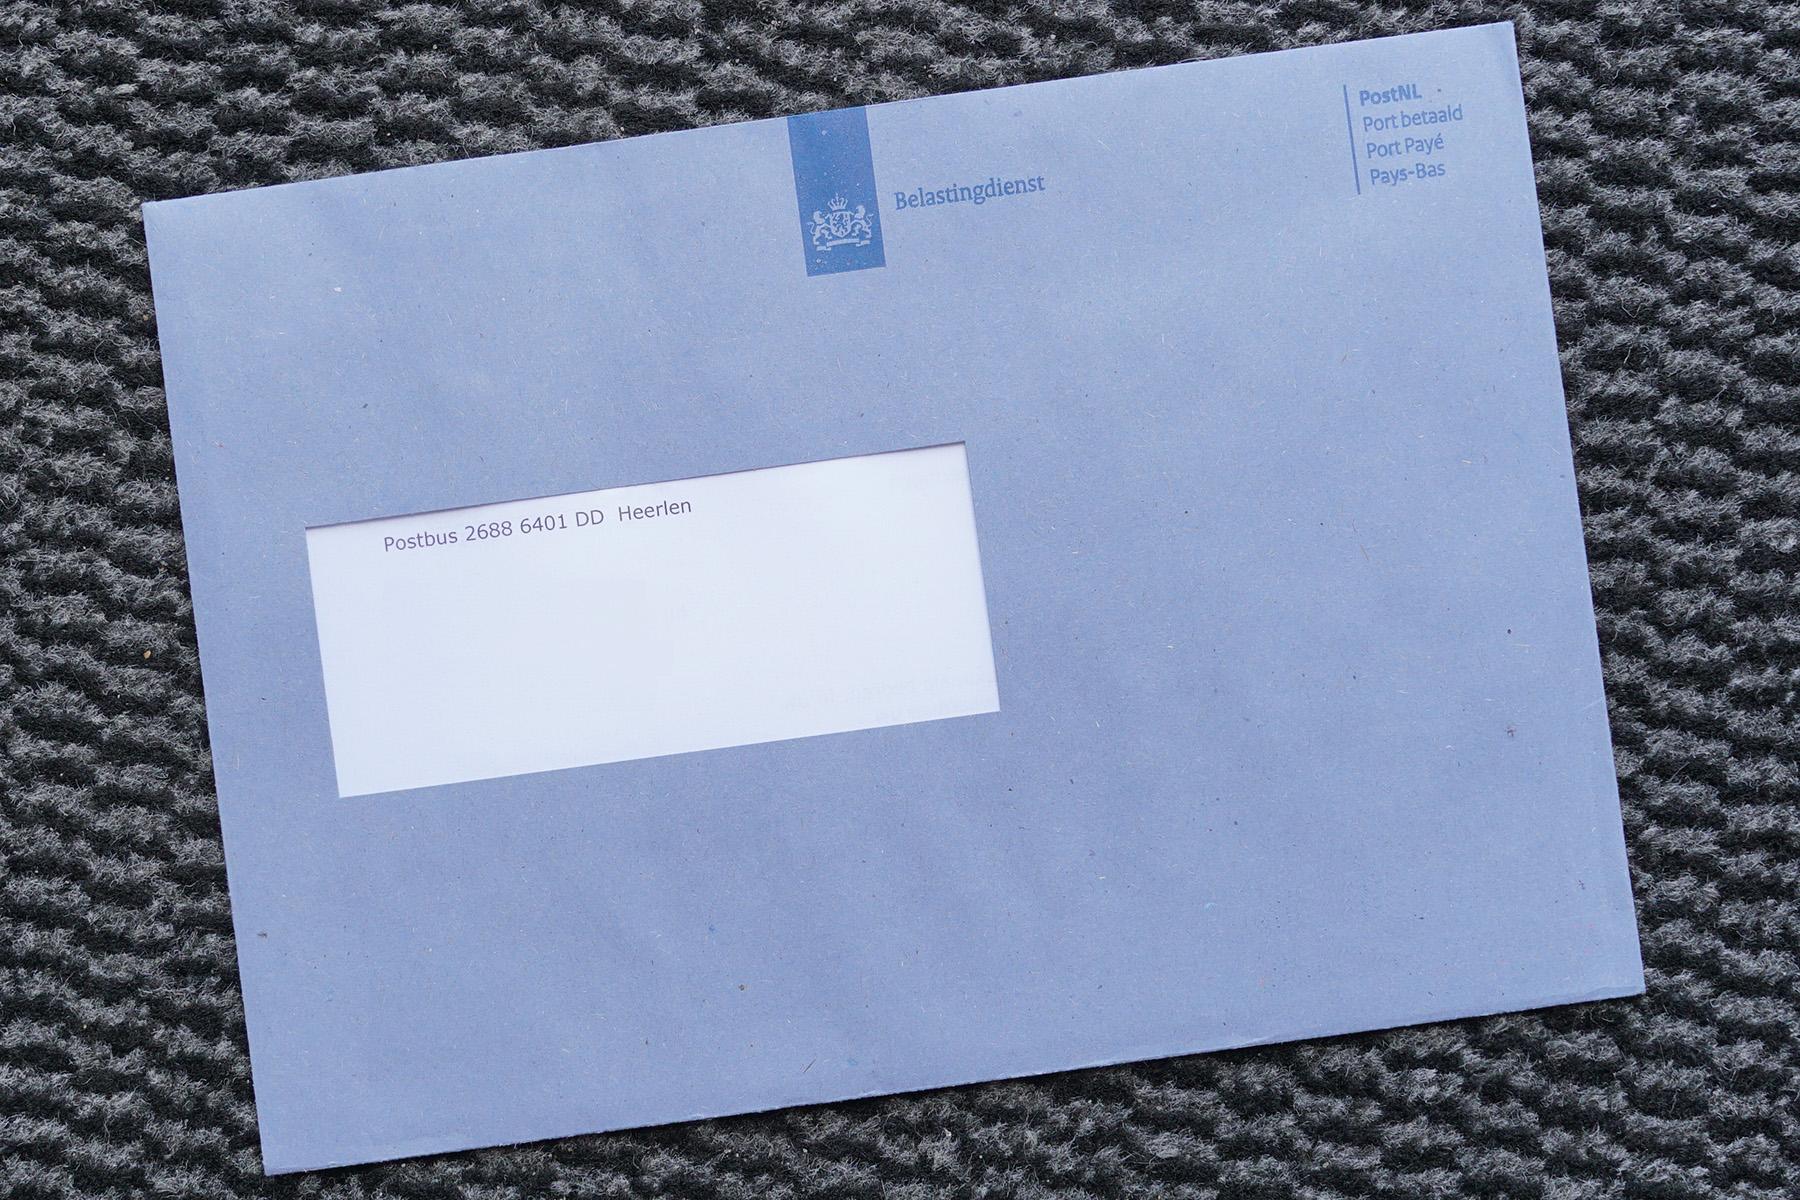 A Belastingdienst tax letter